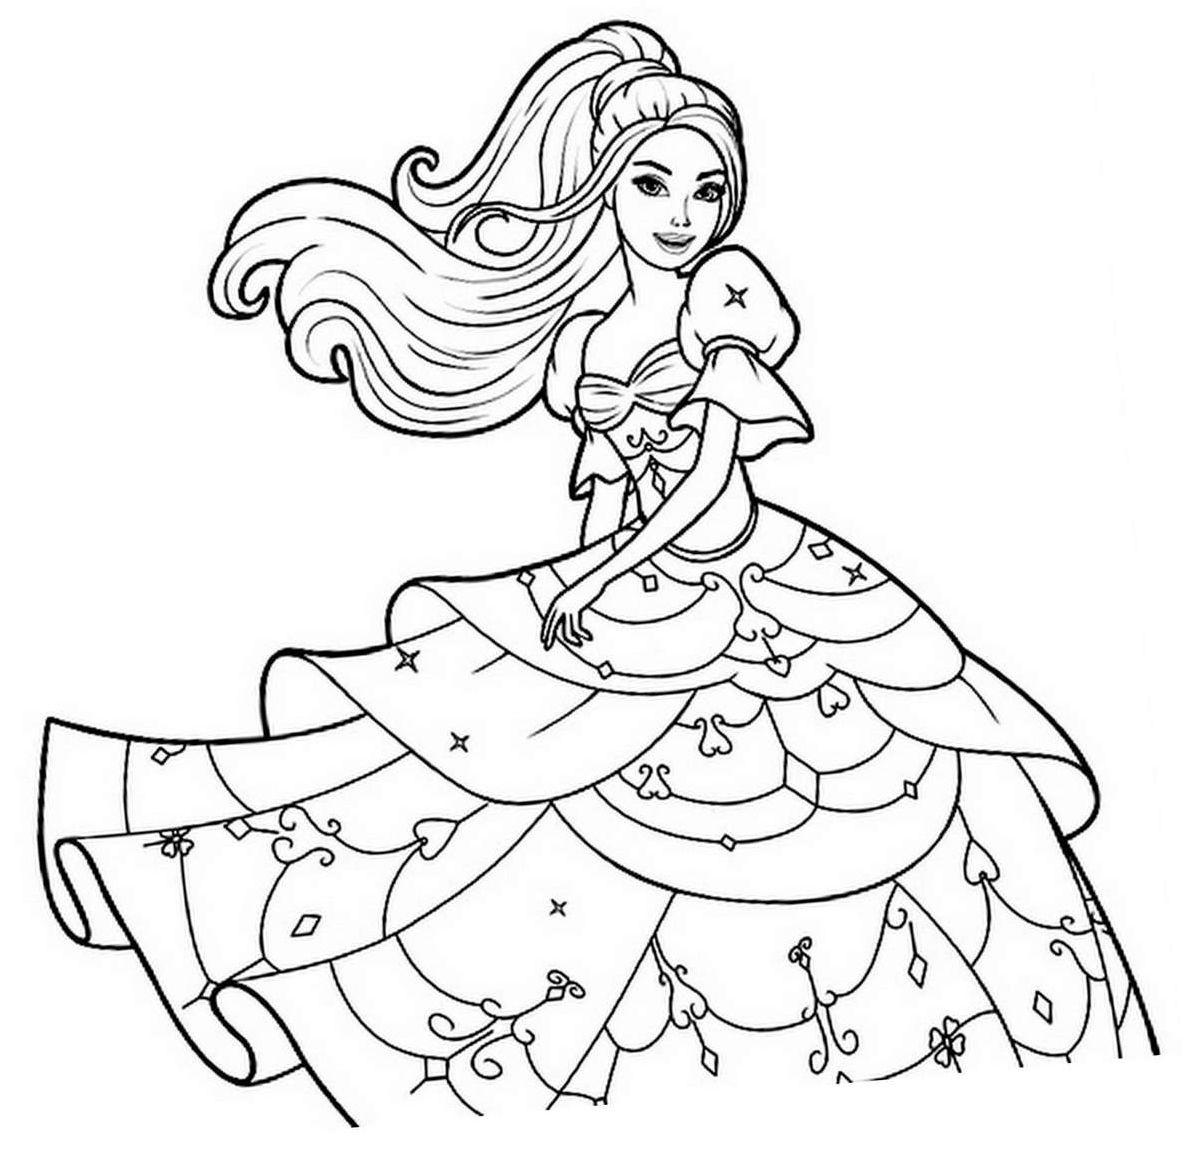 Barbie Ausmalbilder Kostenlos Malen : Coloriage Barbie Et Sa Belle Robe